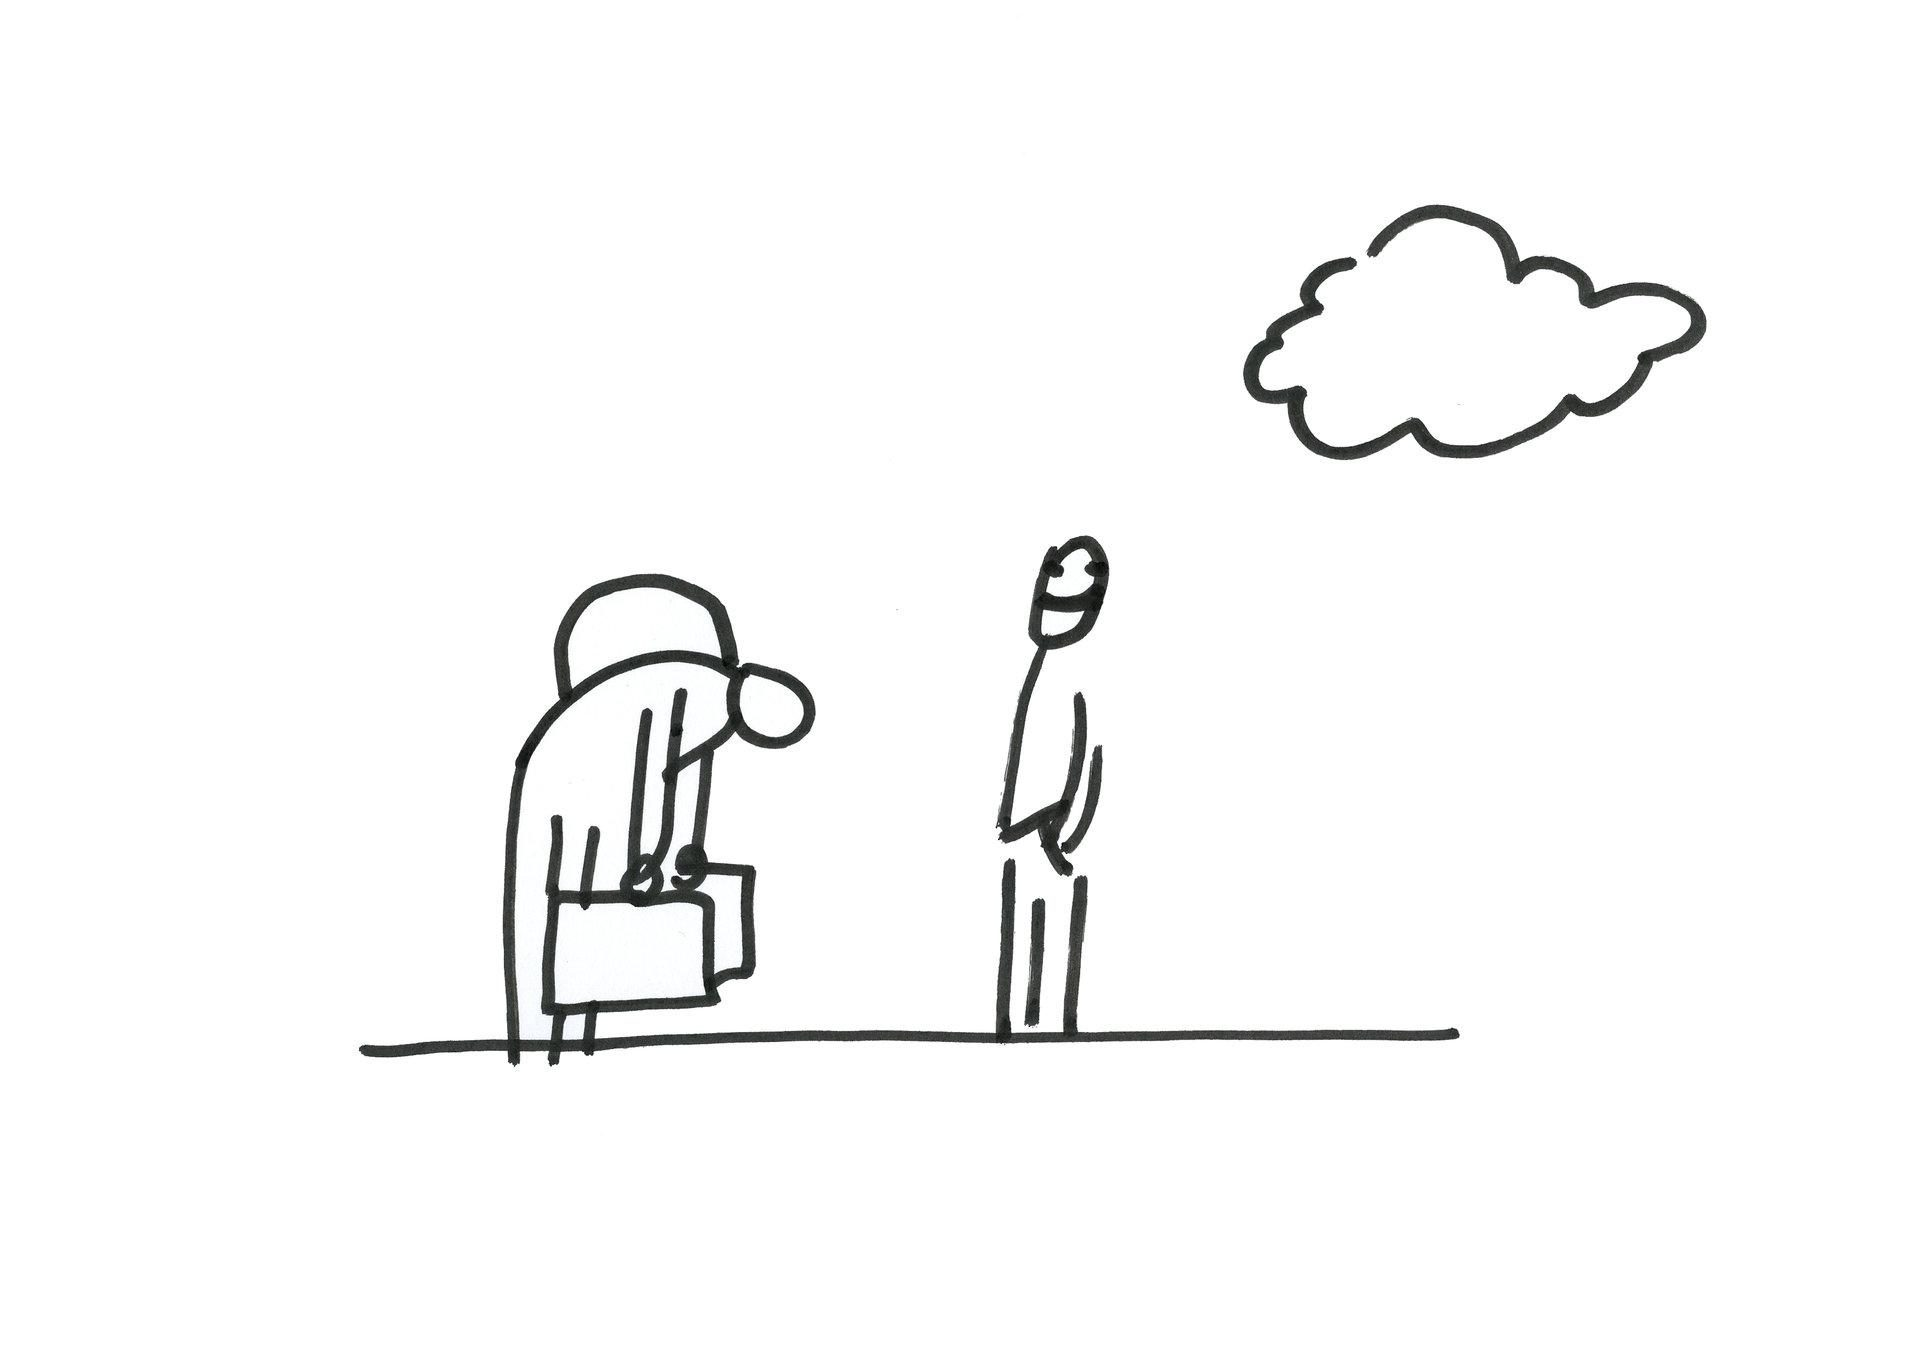 Dan Perjovschi, Come Cloud With Me (10/20), 2012